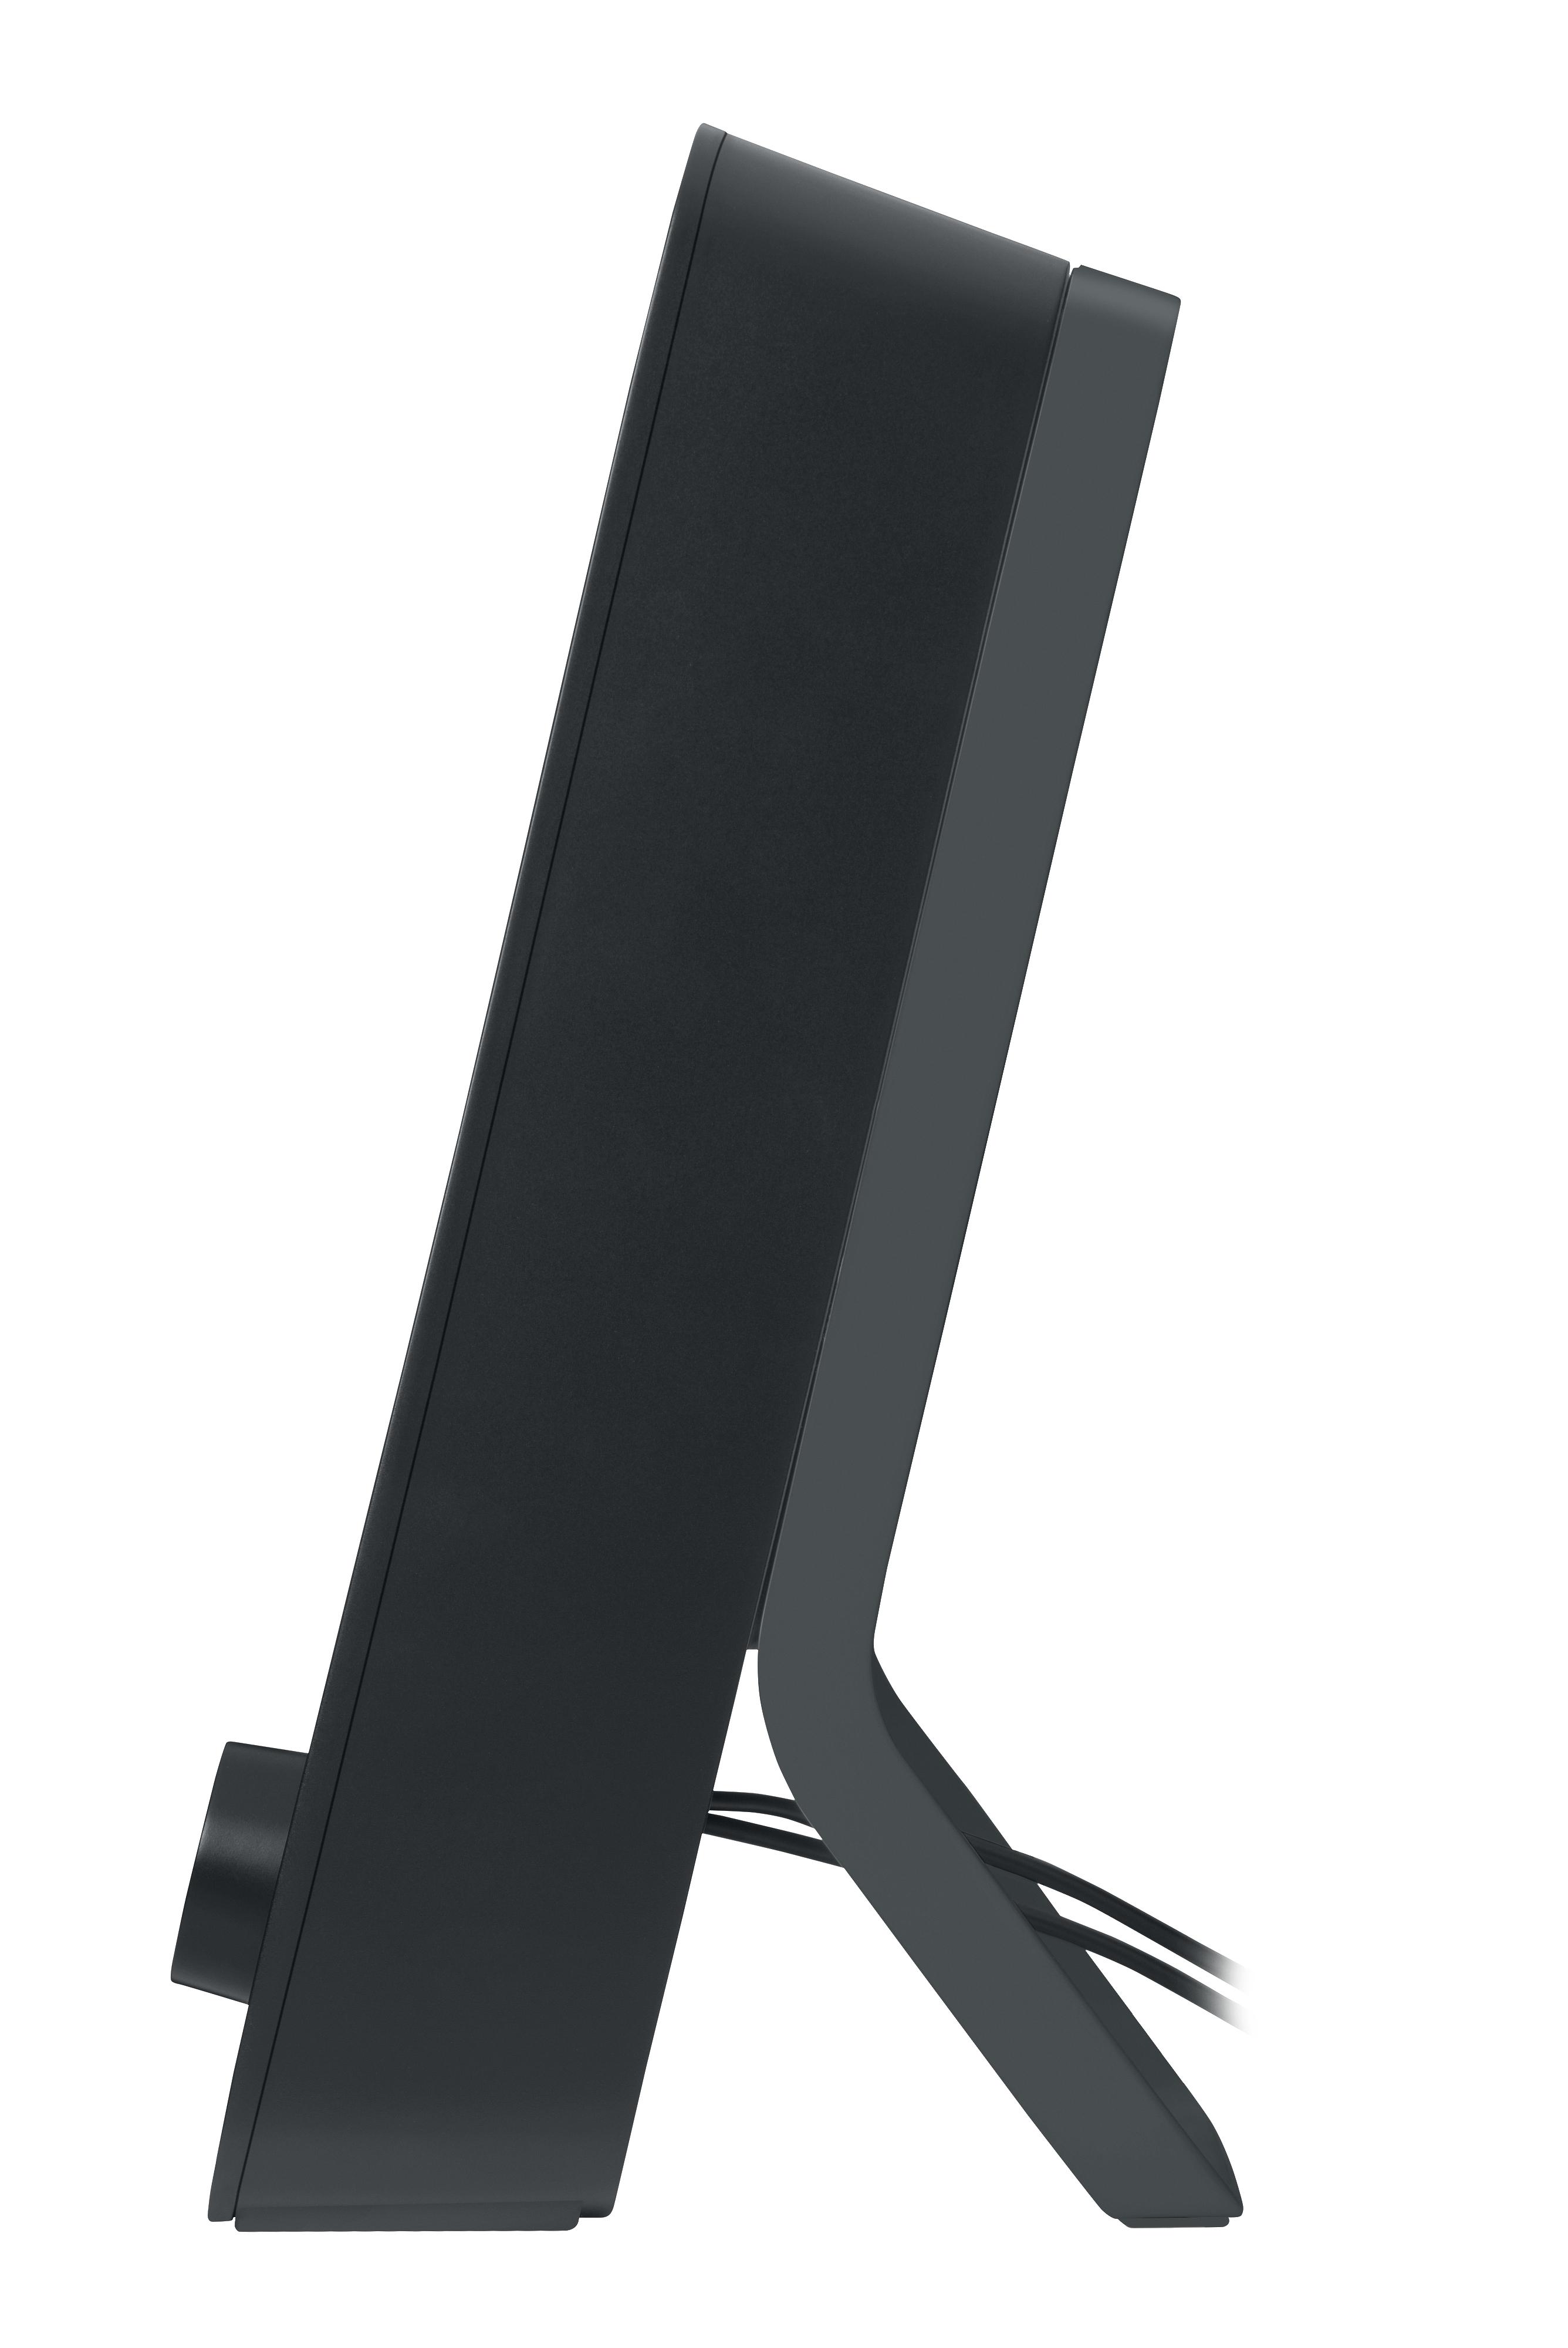 Z207 Speakers 2.0 (Bluetooth, 5 Watt, zwart)